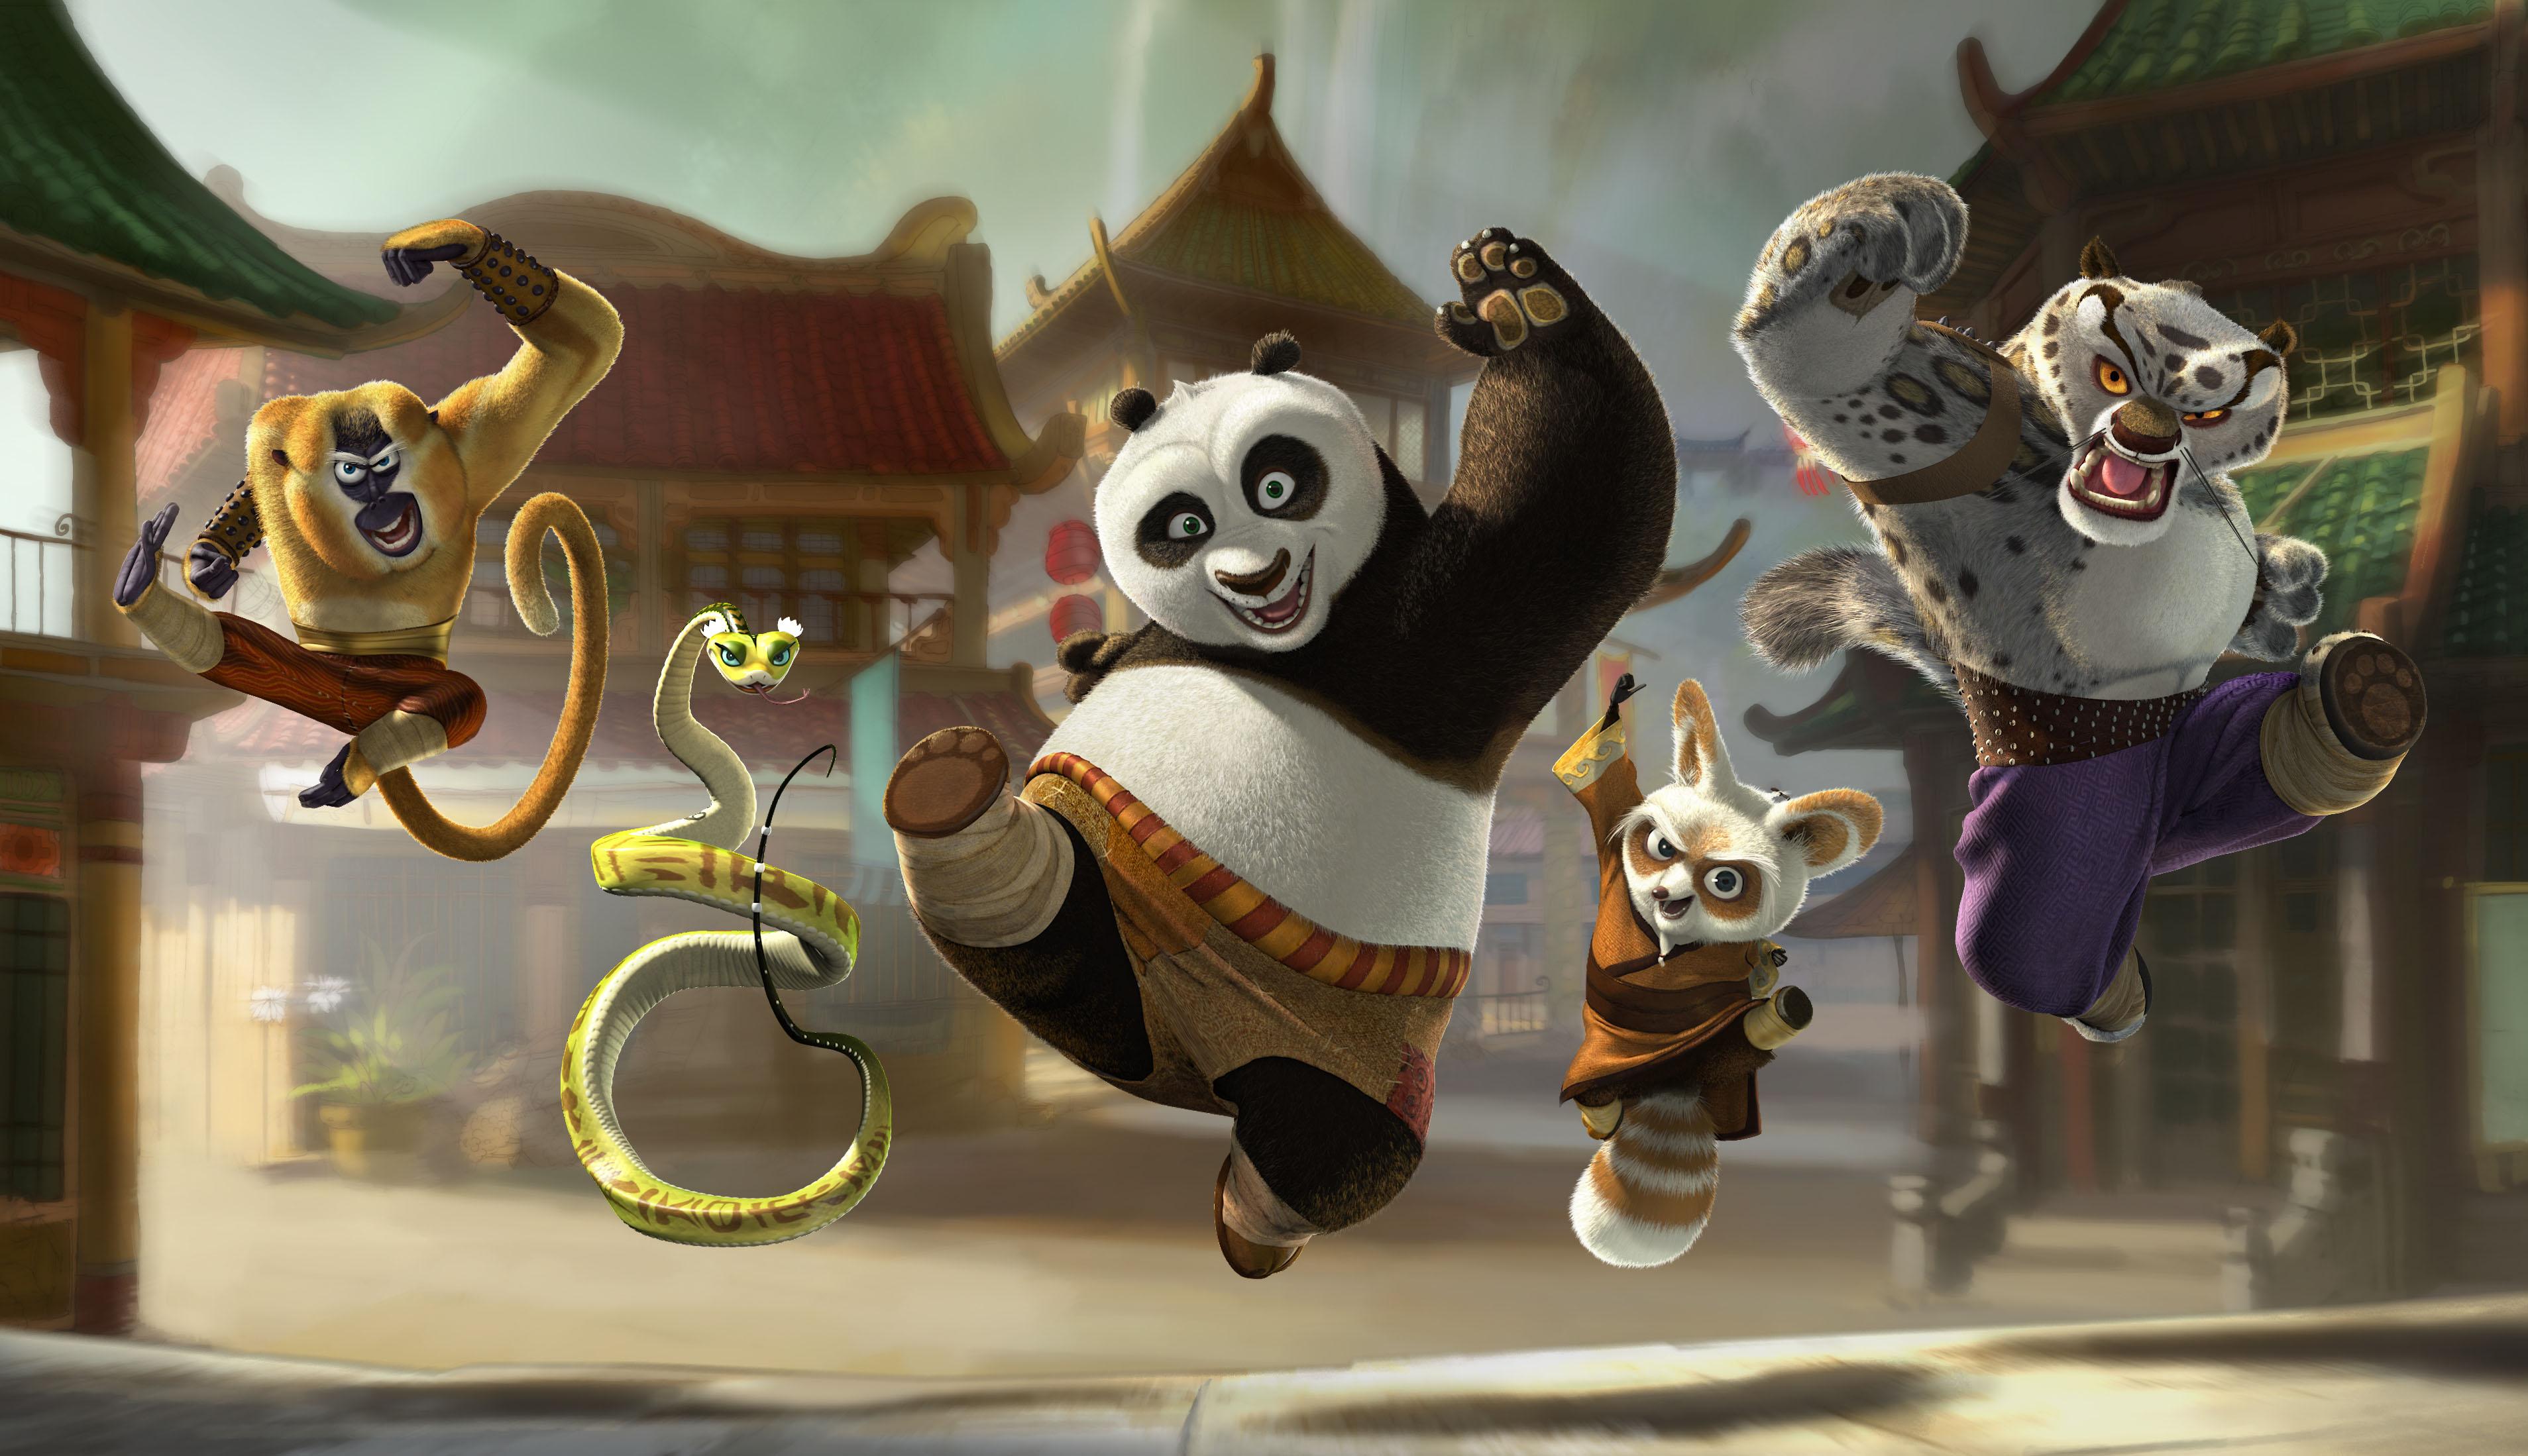 kung-fu-panda_60172fa6